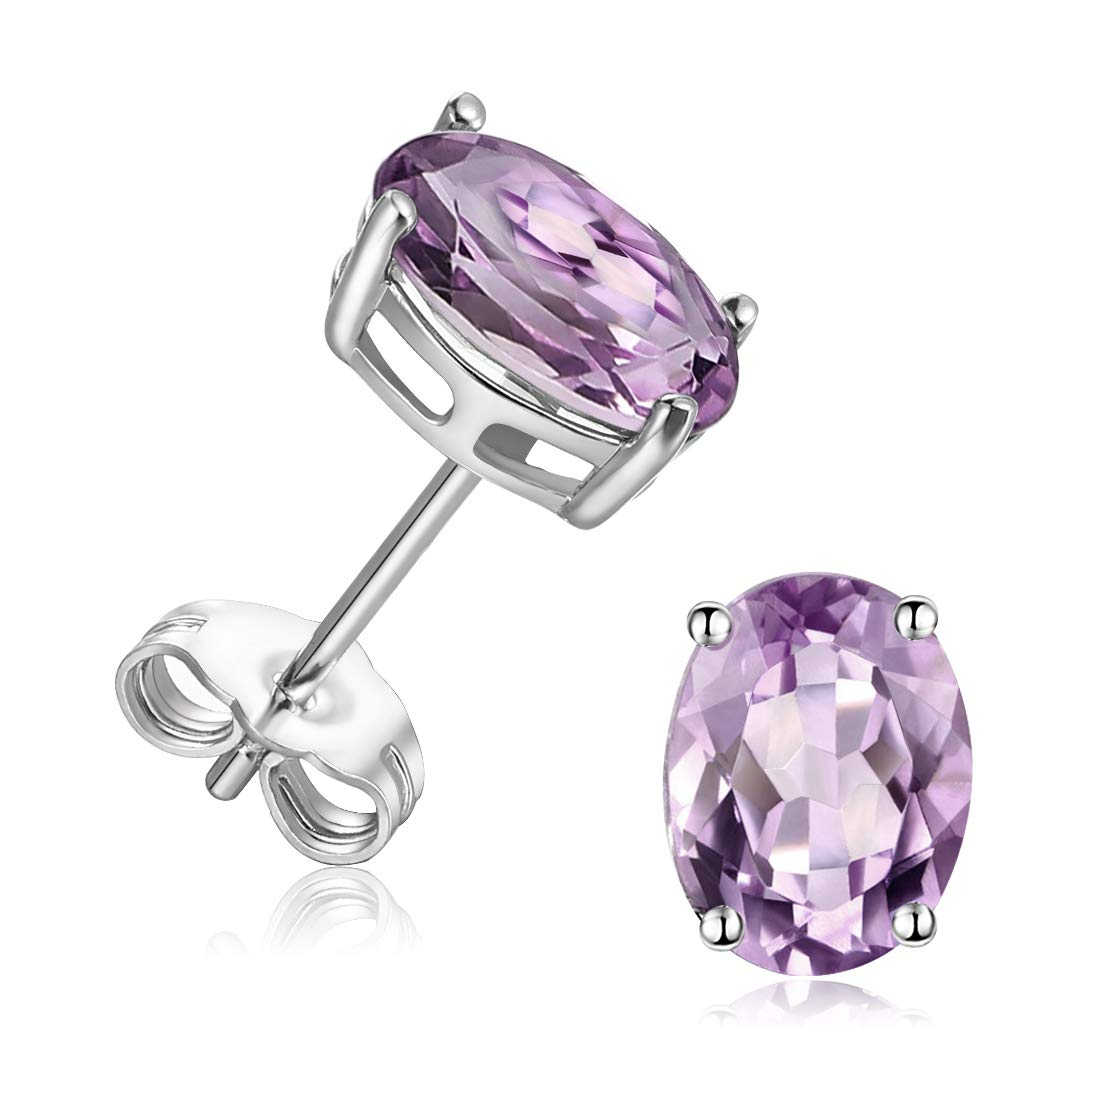 GEMSME 925 Sterling Silver 6.0mm Round Gemstone Stud Earrings for Women